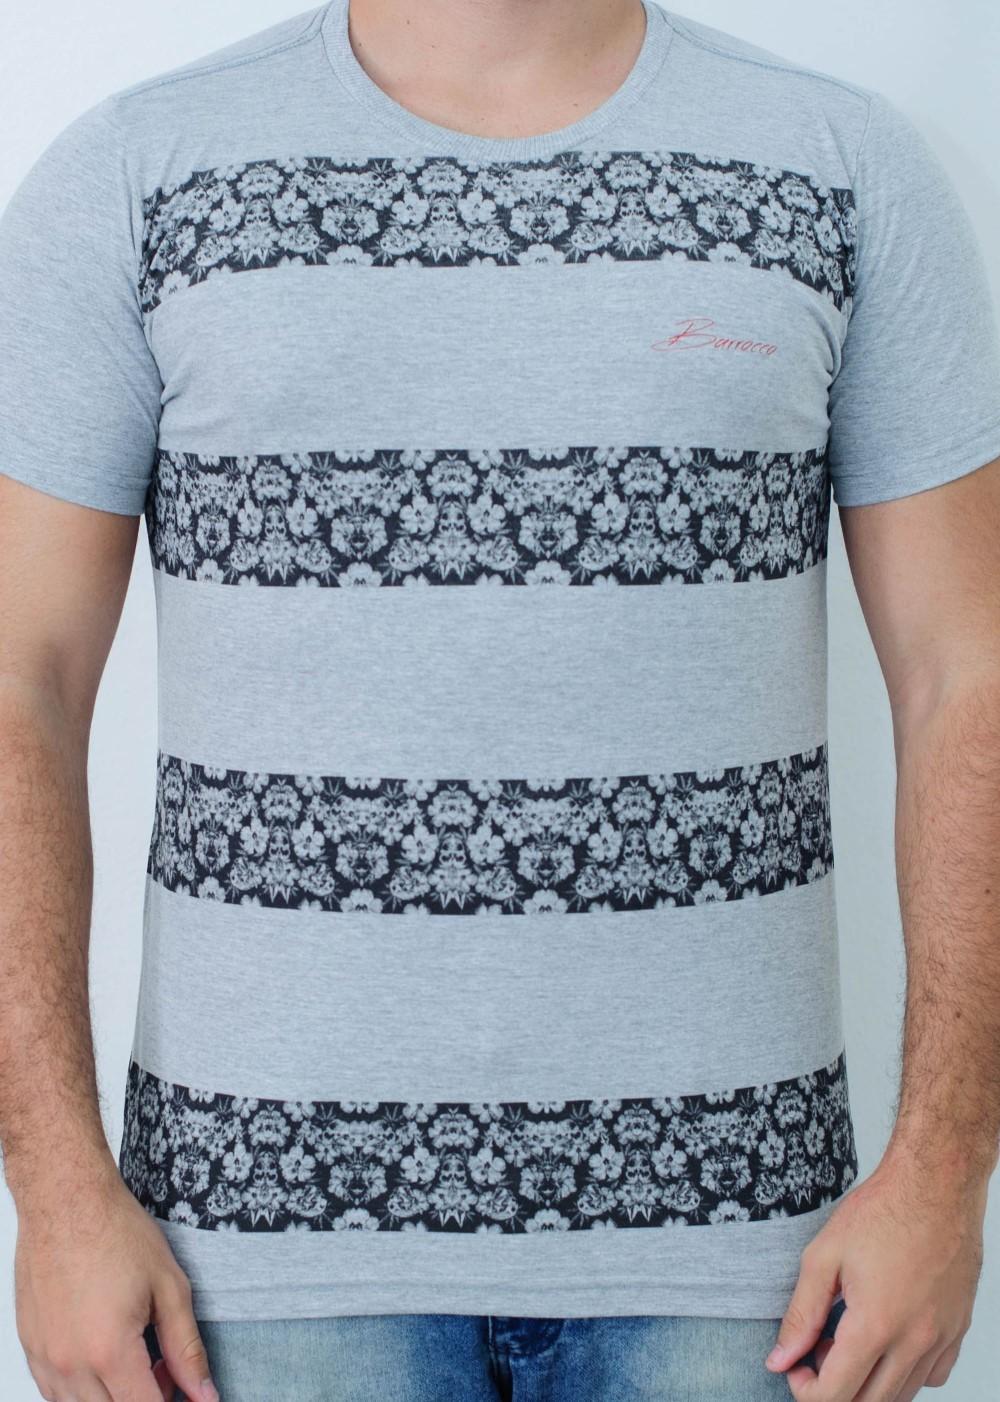 Camiseta Barrocco Band Mescla Claro - FRETE GRÁTIS